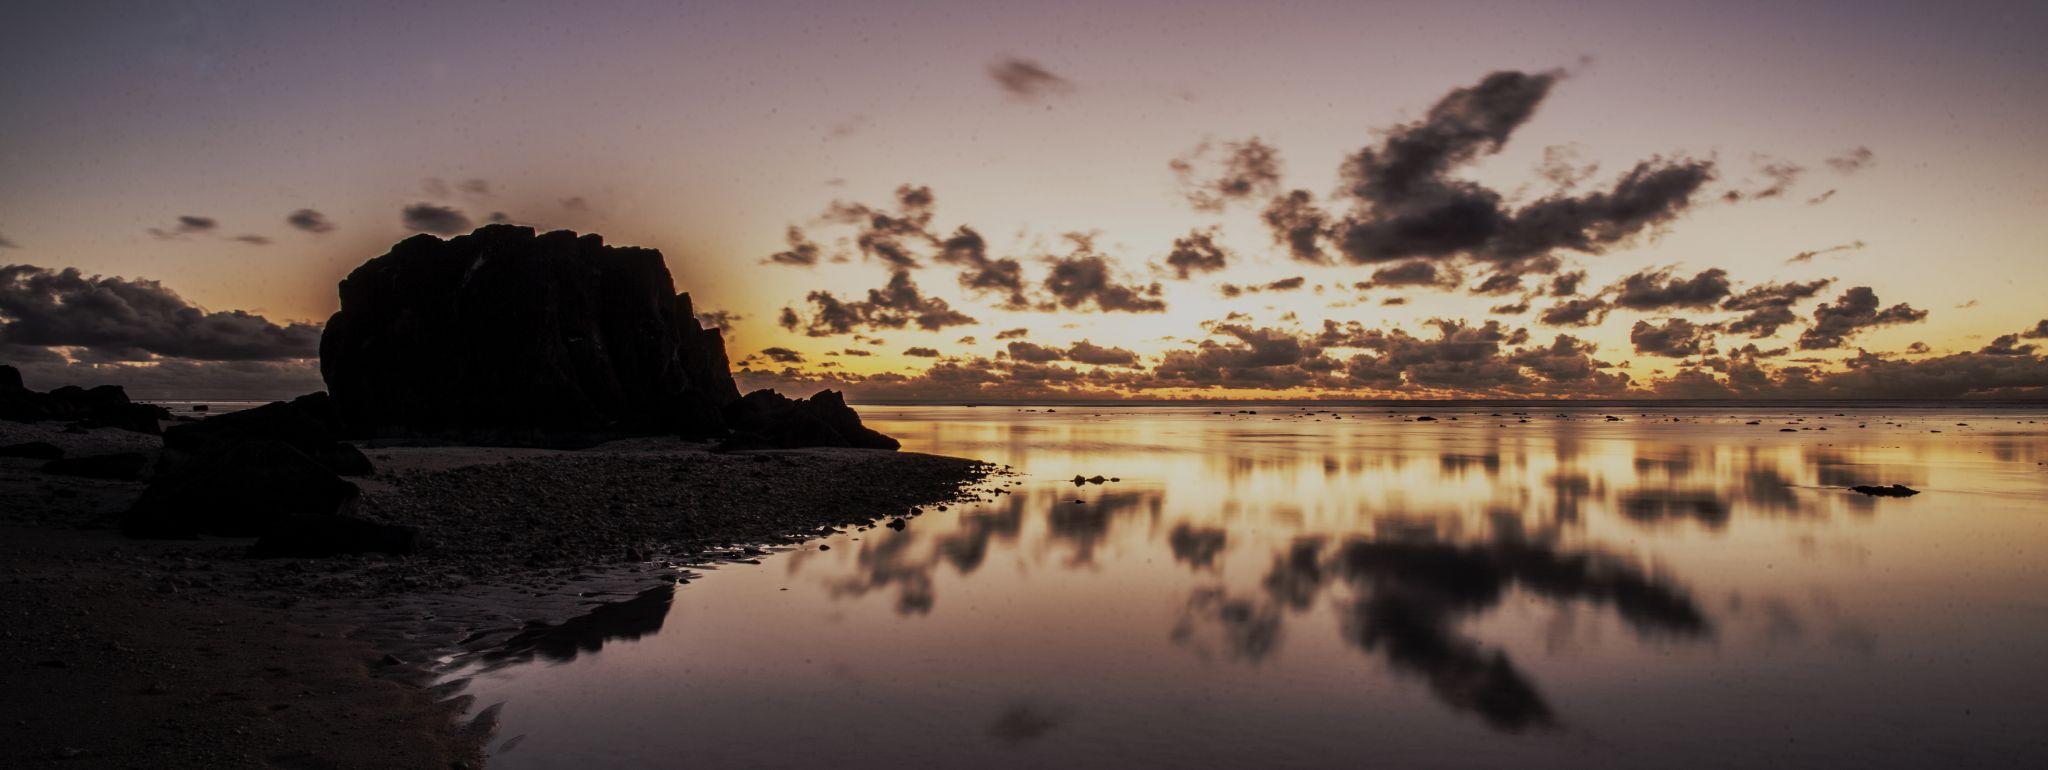 Arorangi beach, Cook islands by Matej Kmet